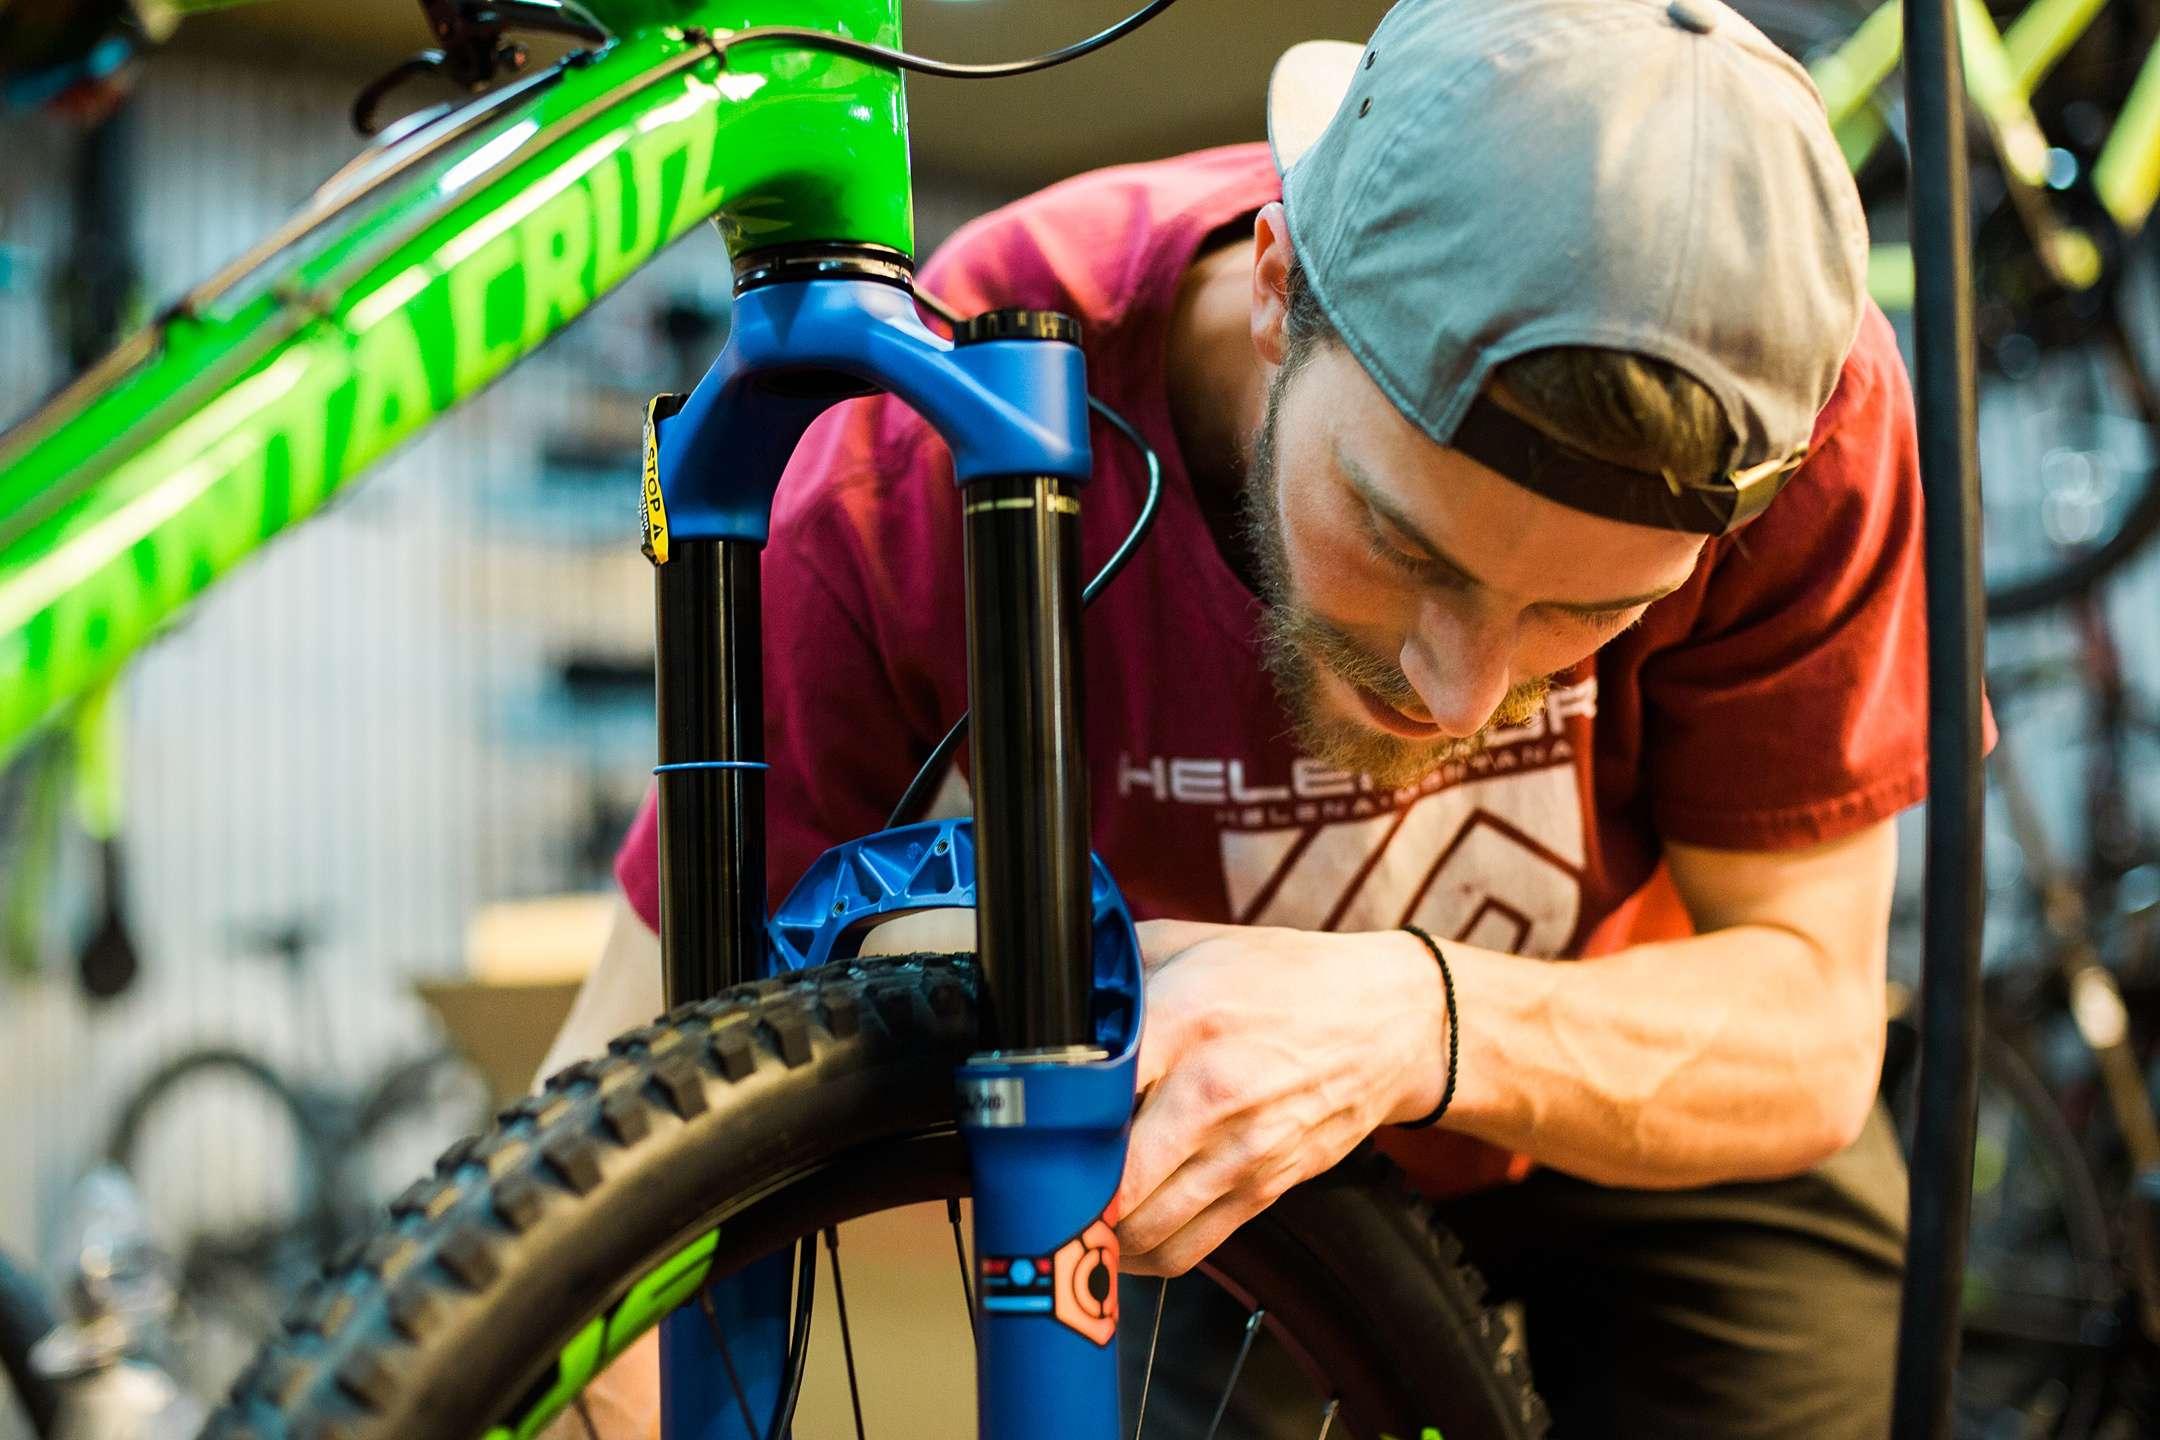 Keenan Cox, Bike Mechanic & Sales at Grand Ridge Cyclery